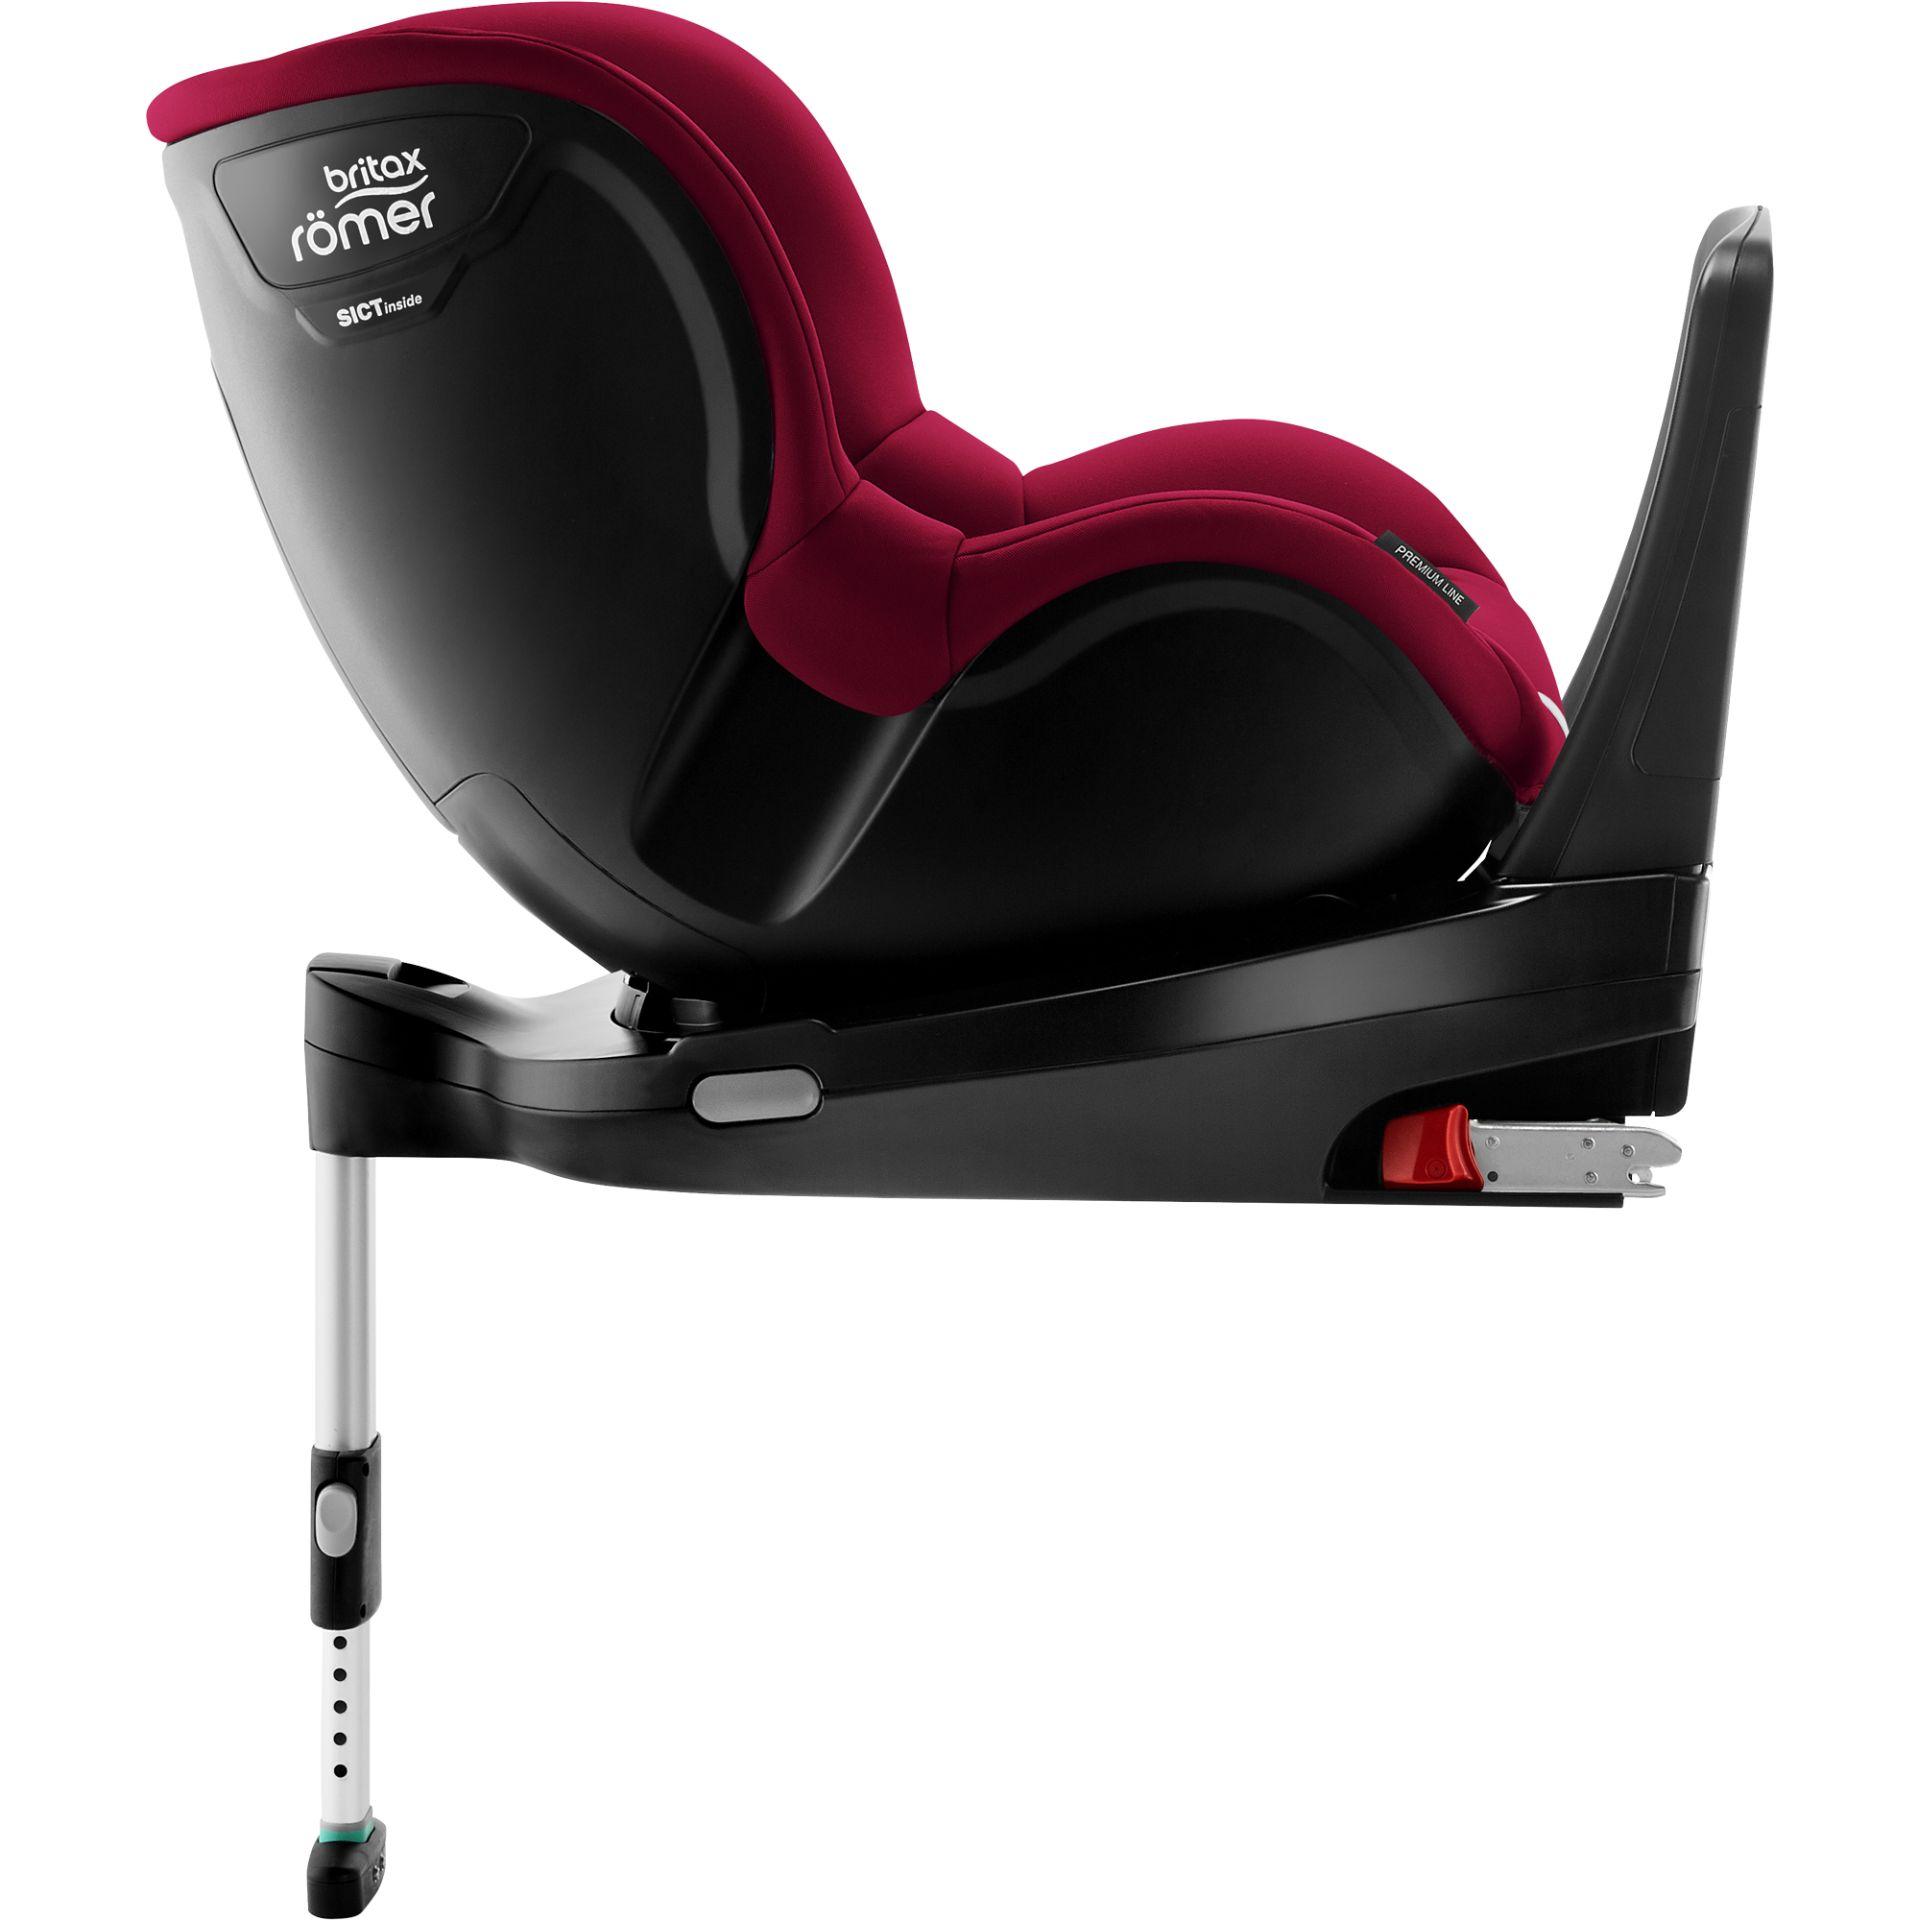 britax r mer kindersitz dualfix i size online kaufen bei. Black Bedroom Furniture Sets. Home Design Ideas